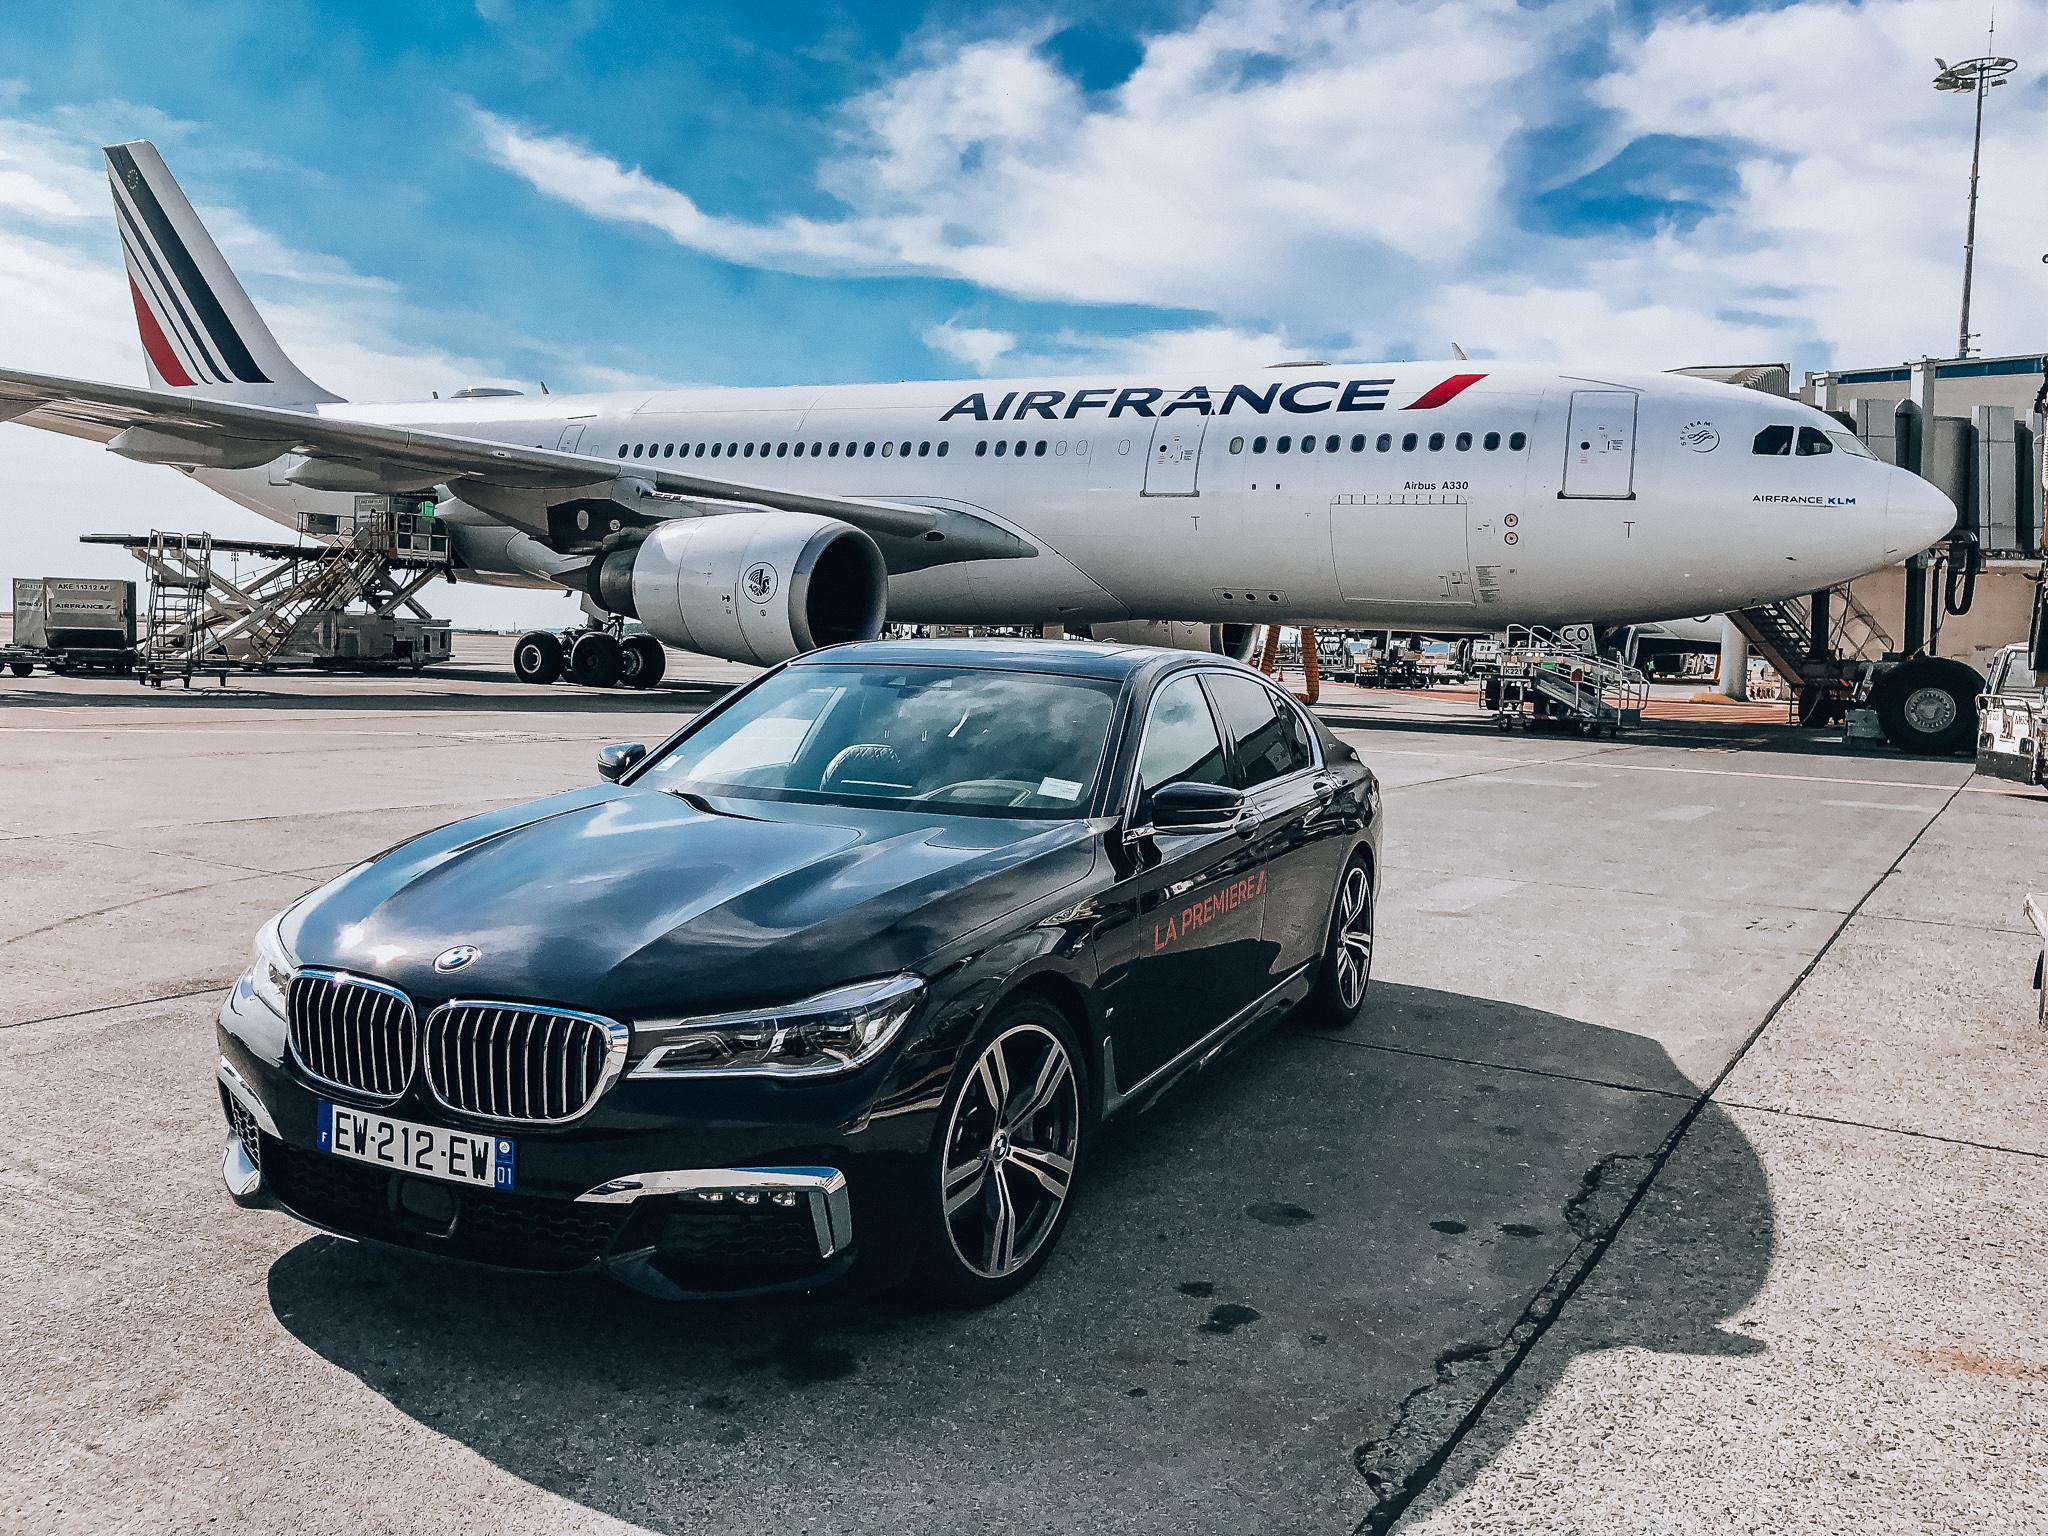 Air France La Premiere First Class.jpg